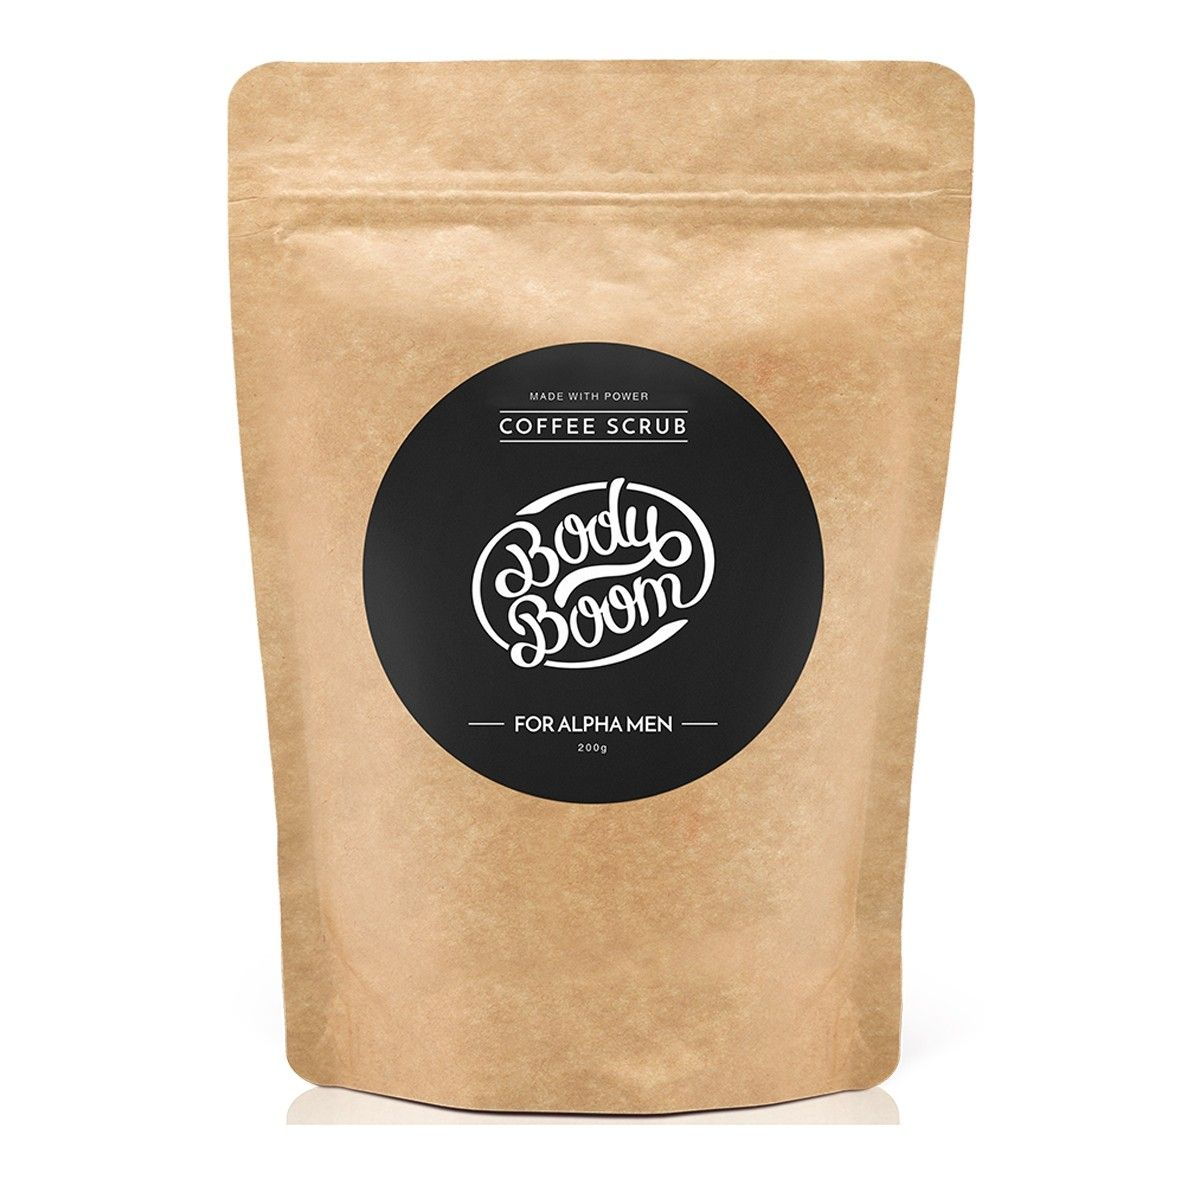 Afbeelding van Bodyboom Coffee Scrub For Aplha Men Bodyscrub Beauty